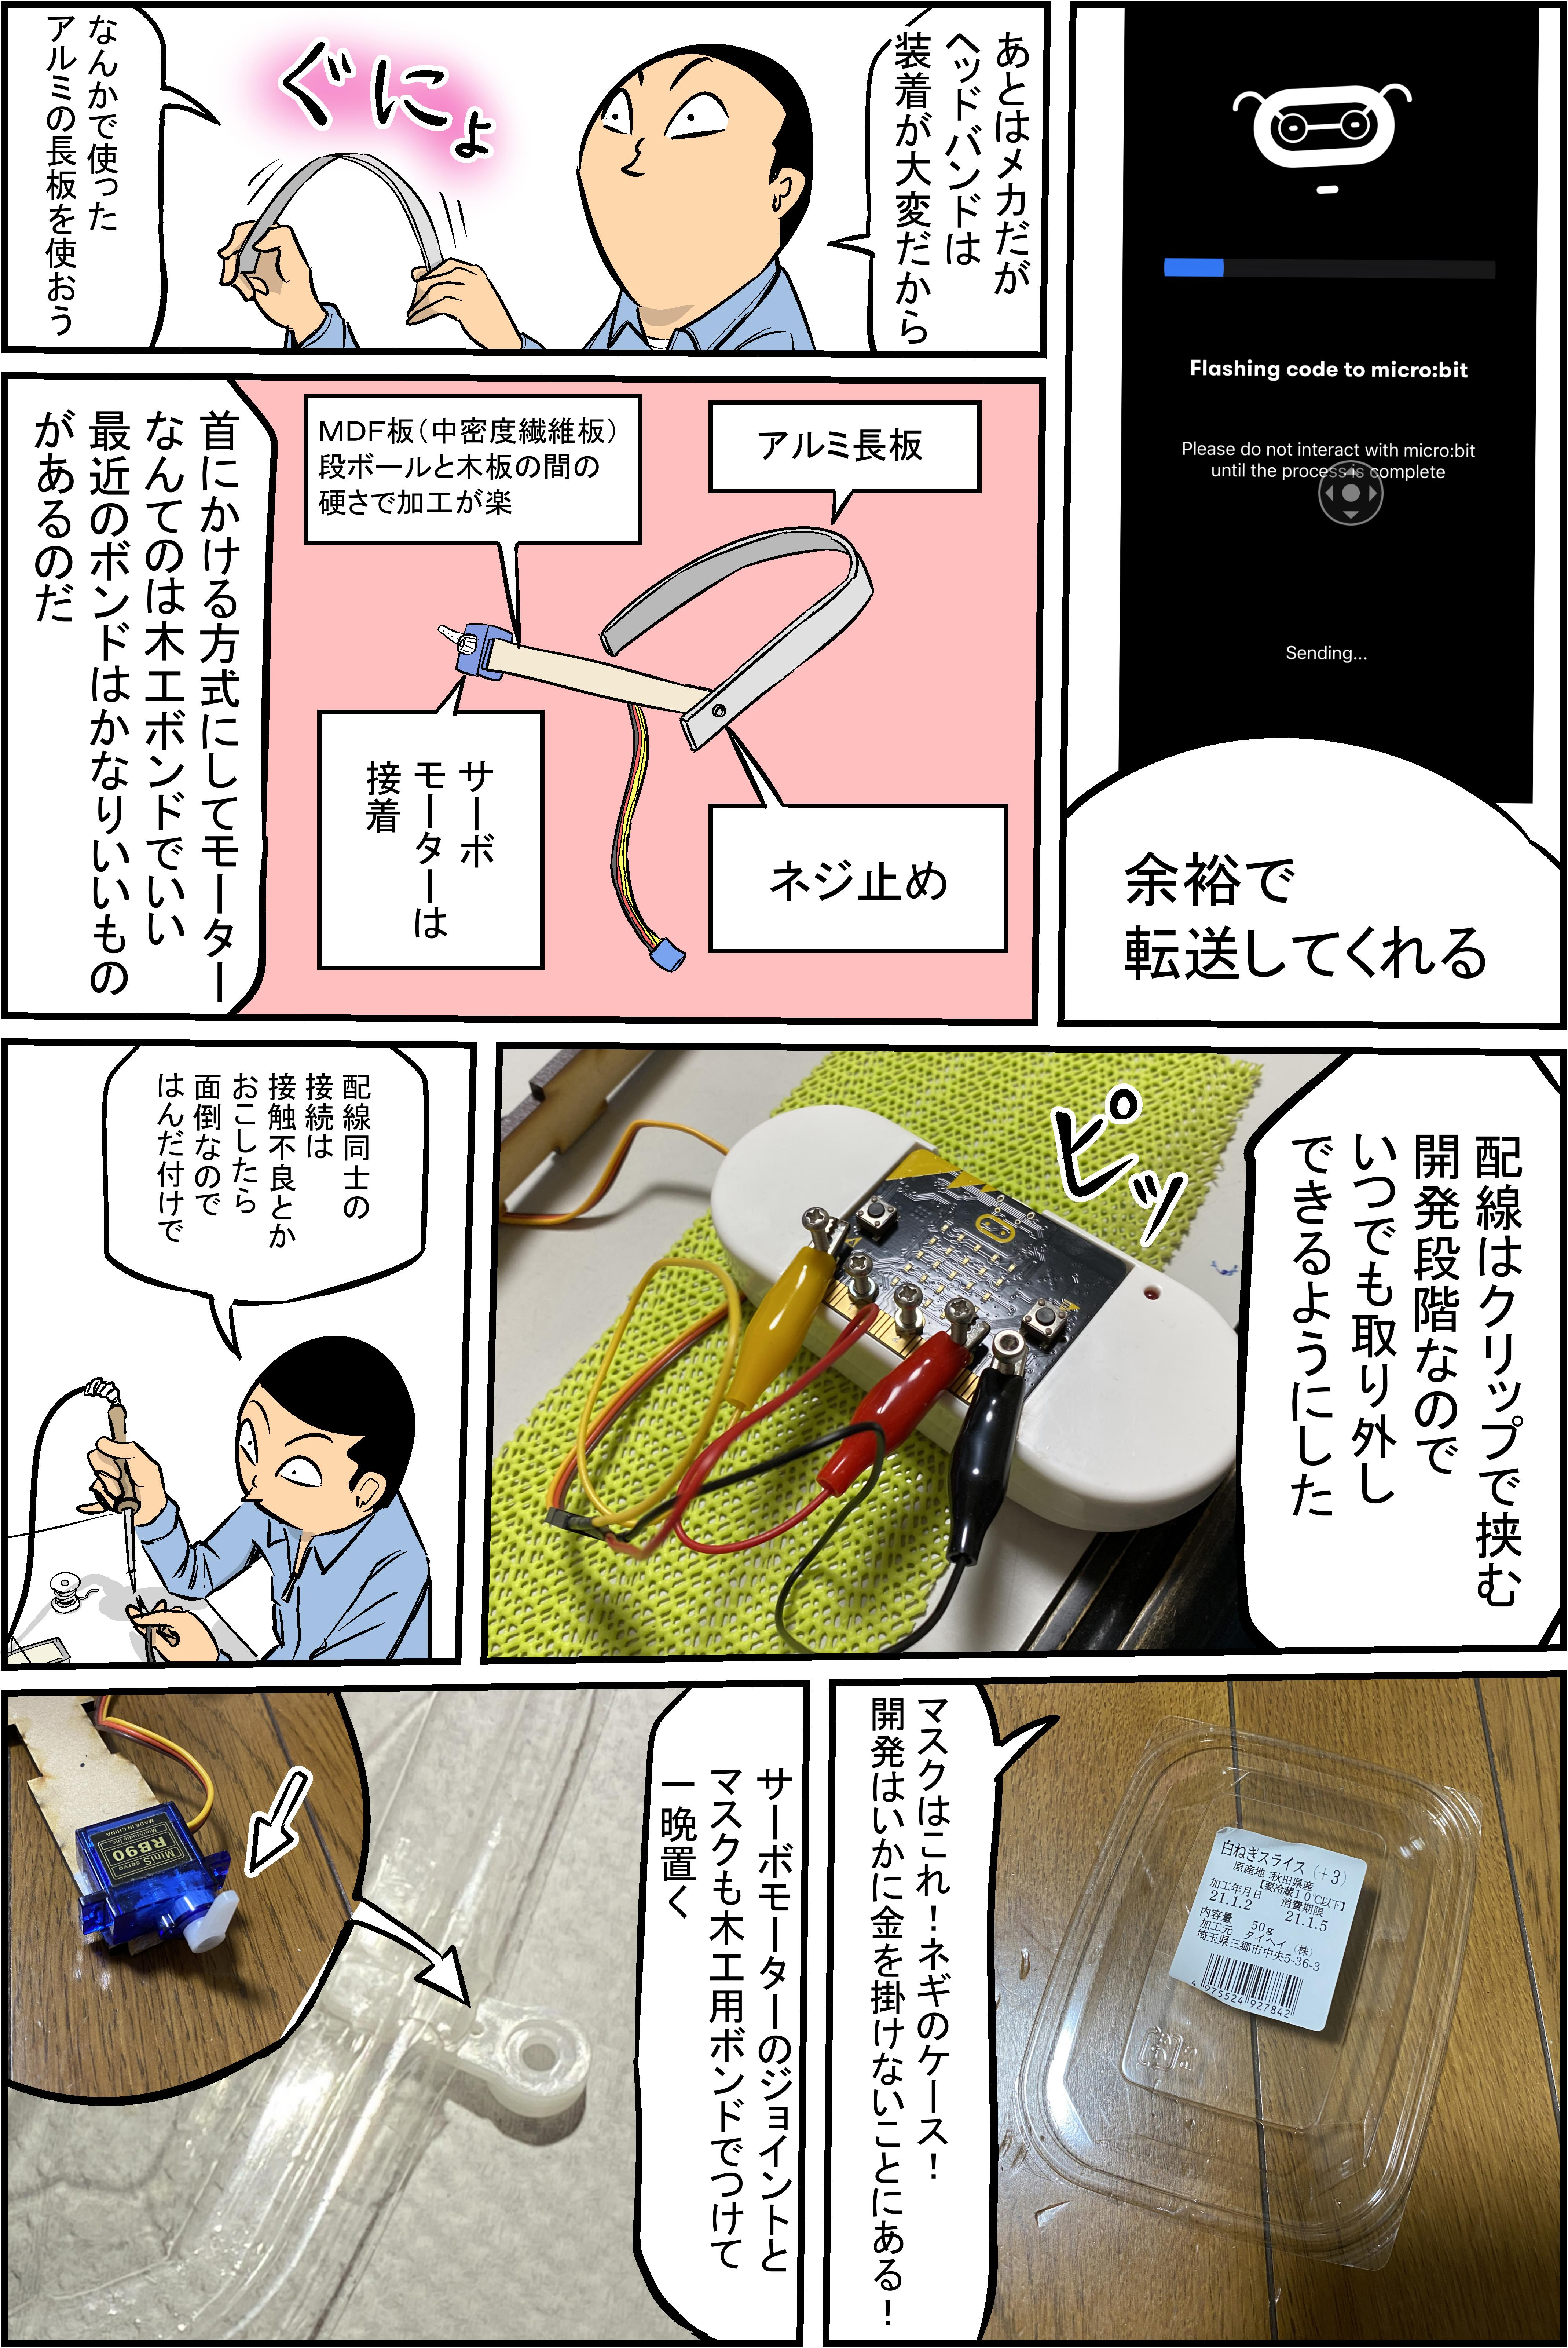 bsm_004-02-04.jpg